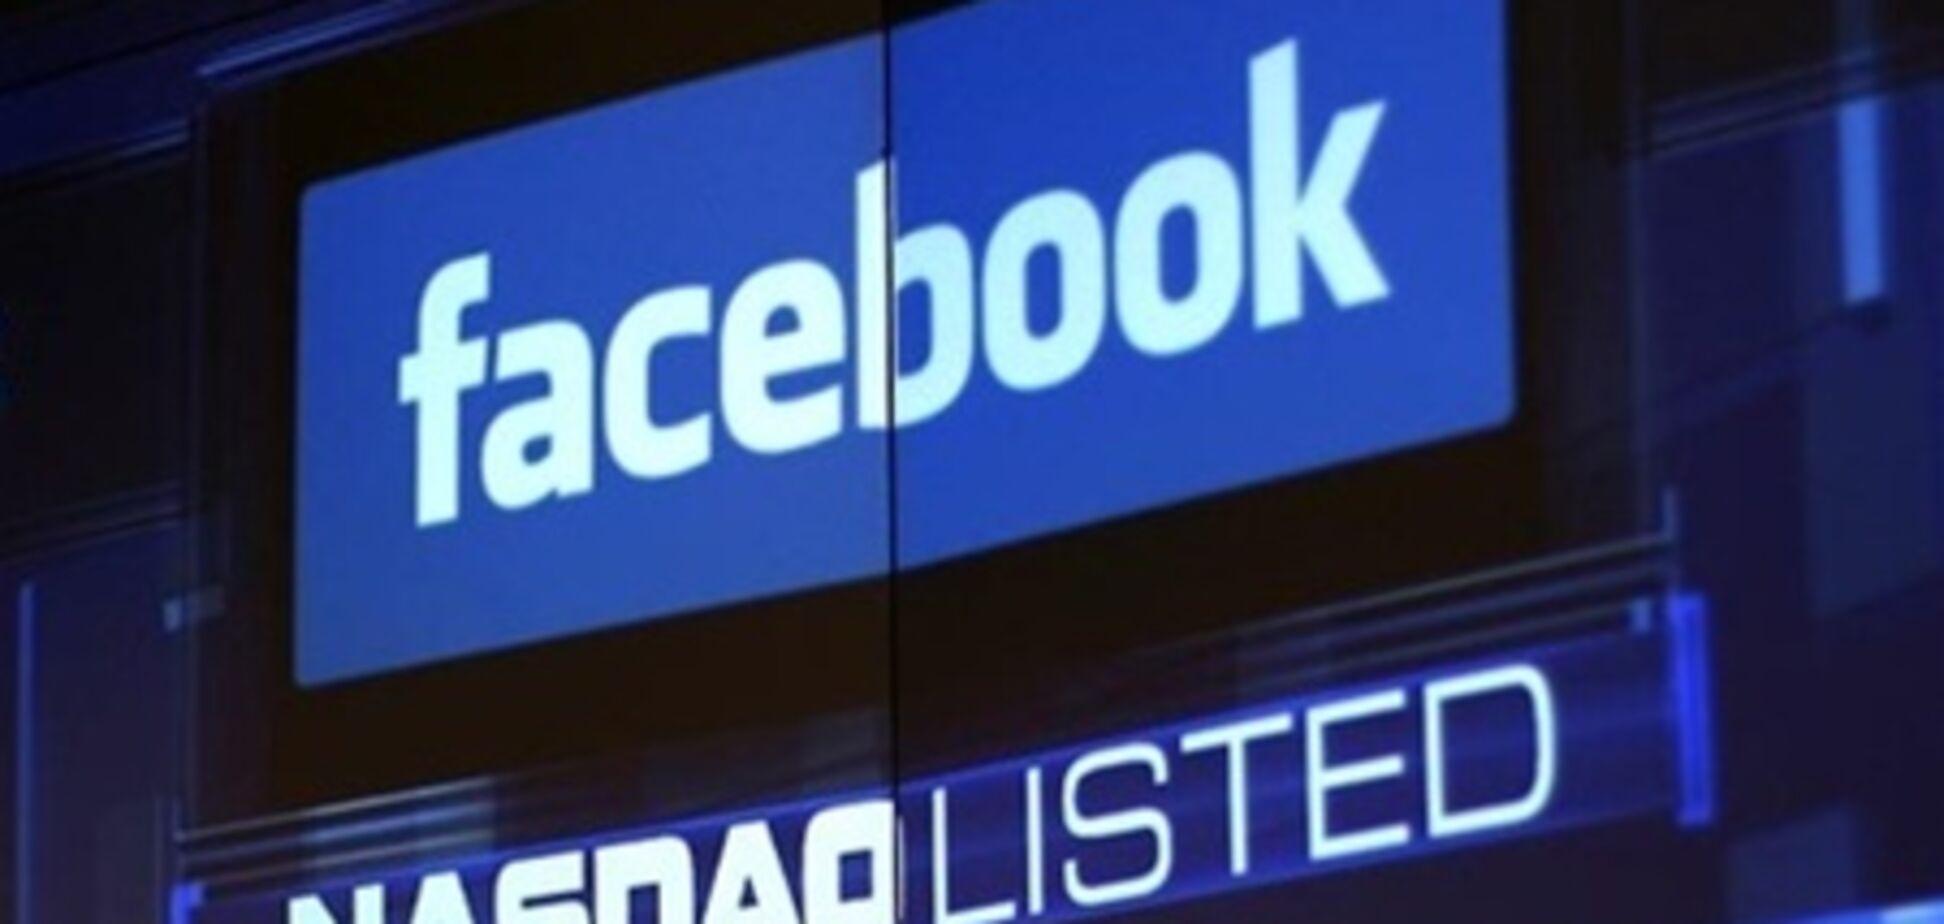 NASDAQ заплатит $10 млн за ошибки при размещении акций Facebook